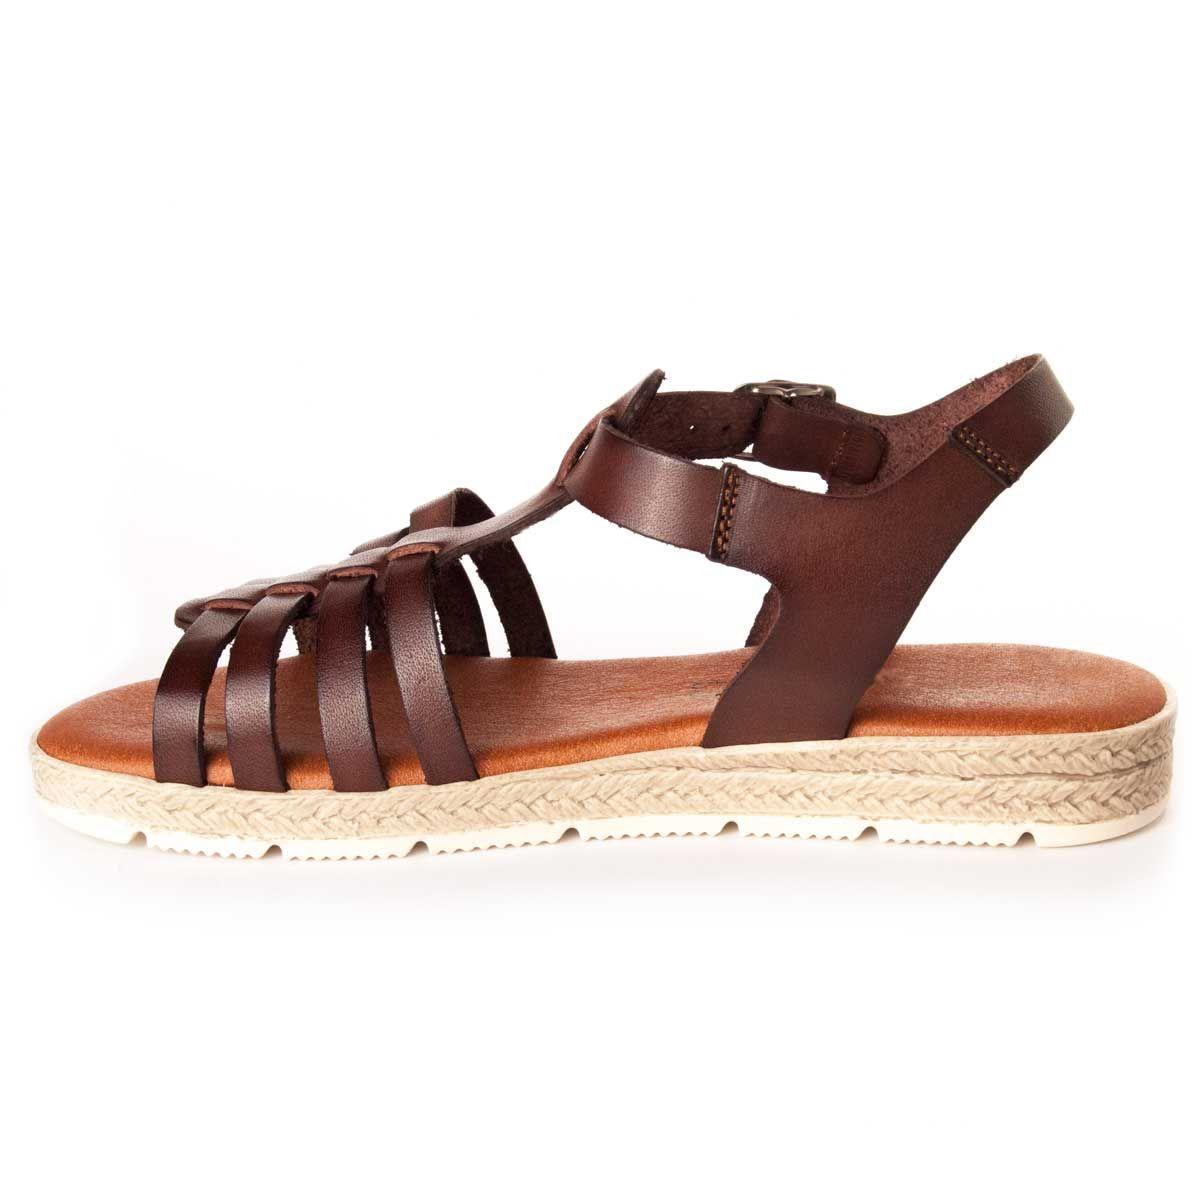 Montevita Flat Gladiator Sandal in Brown